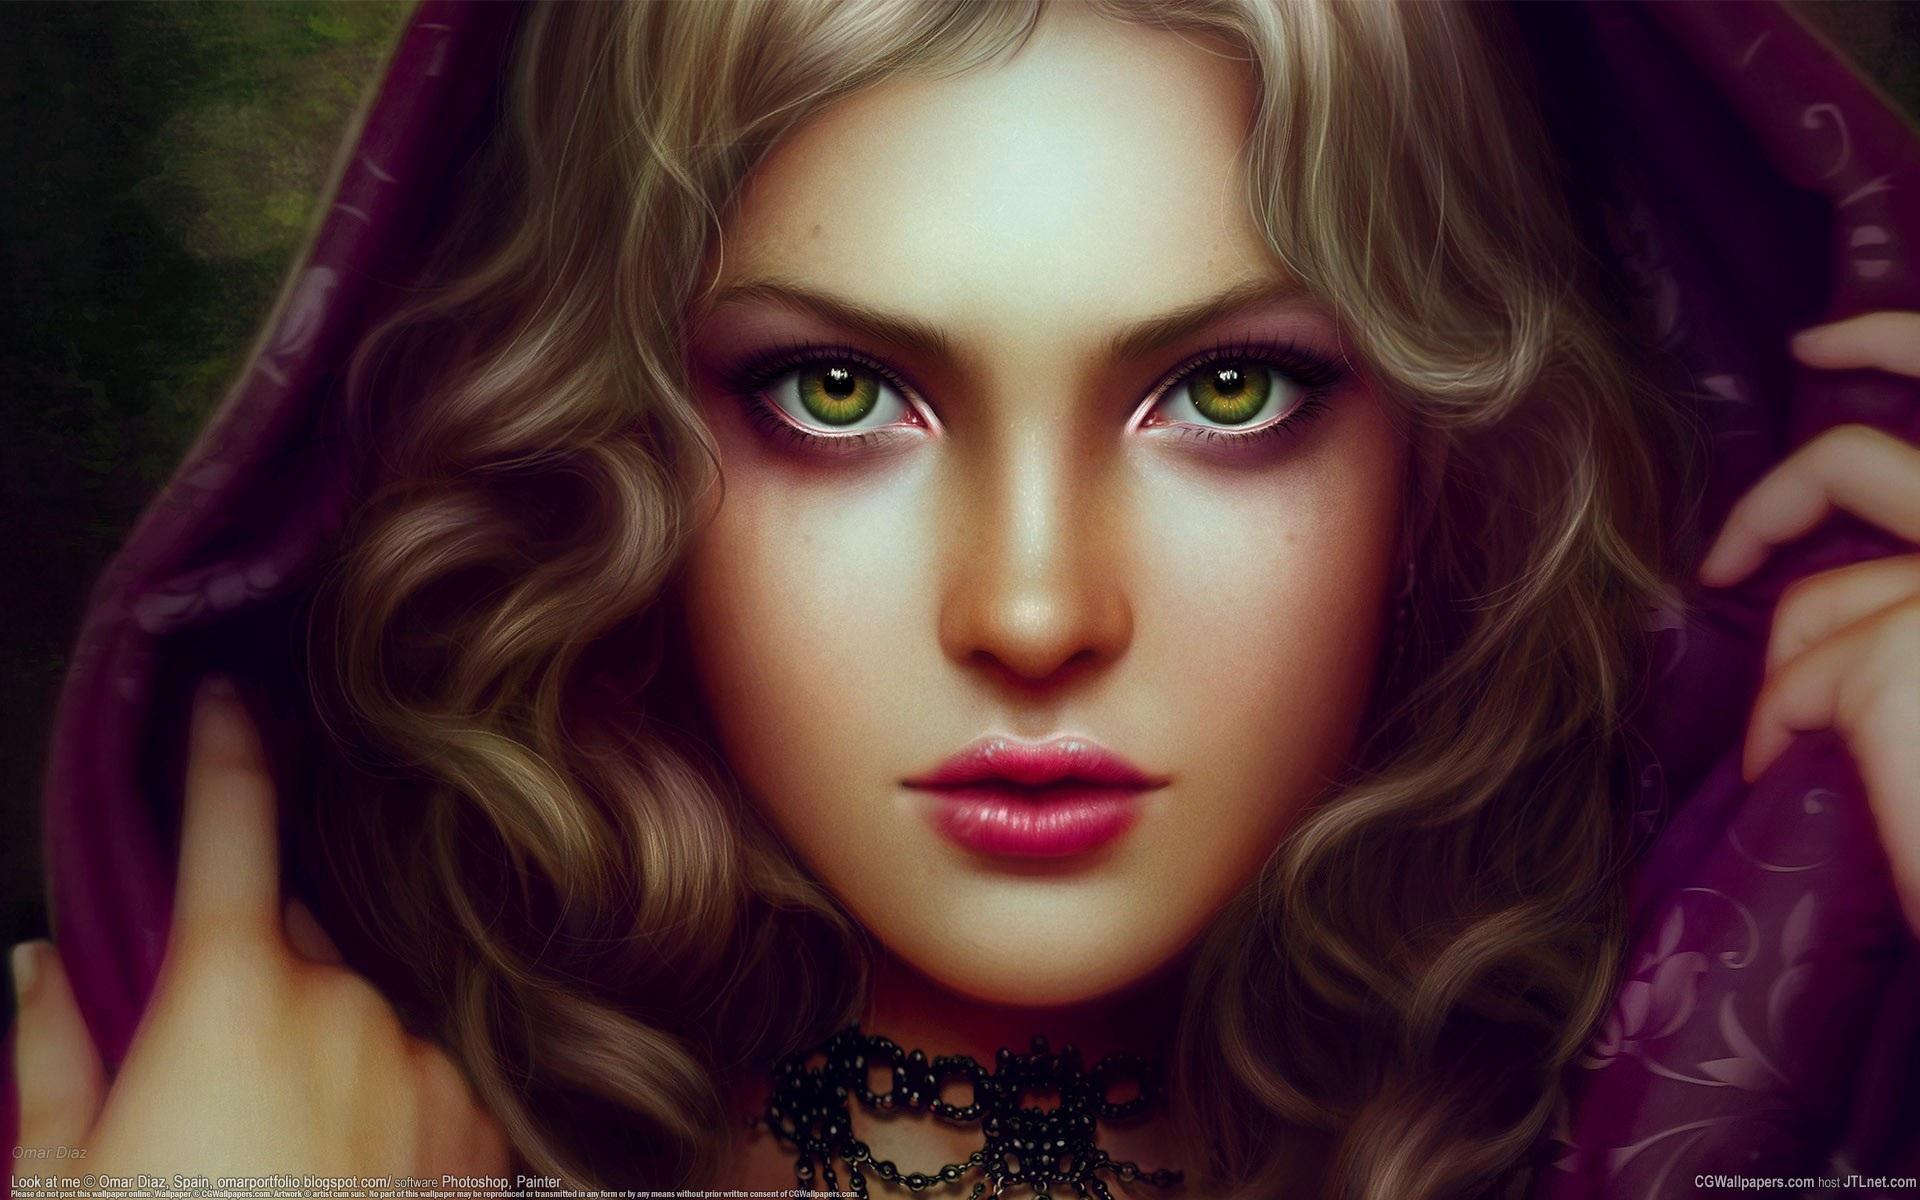 Download This Wallpaper - Beautiful Women In Fantasy Art , HD Wallpaper & Backgrounds